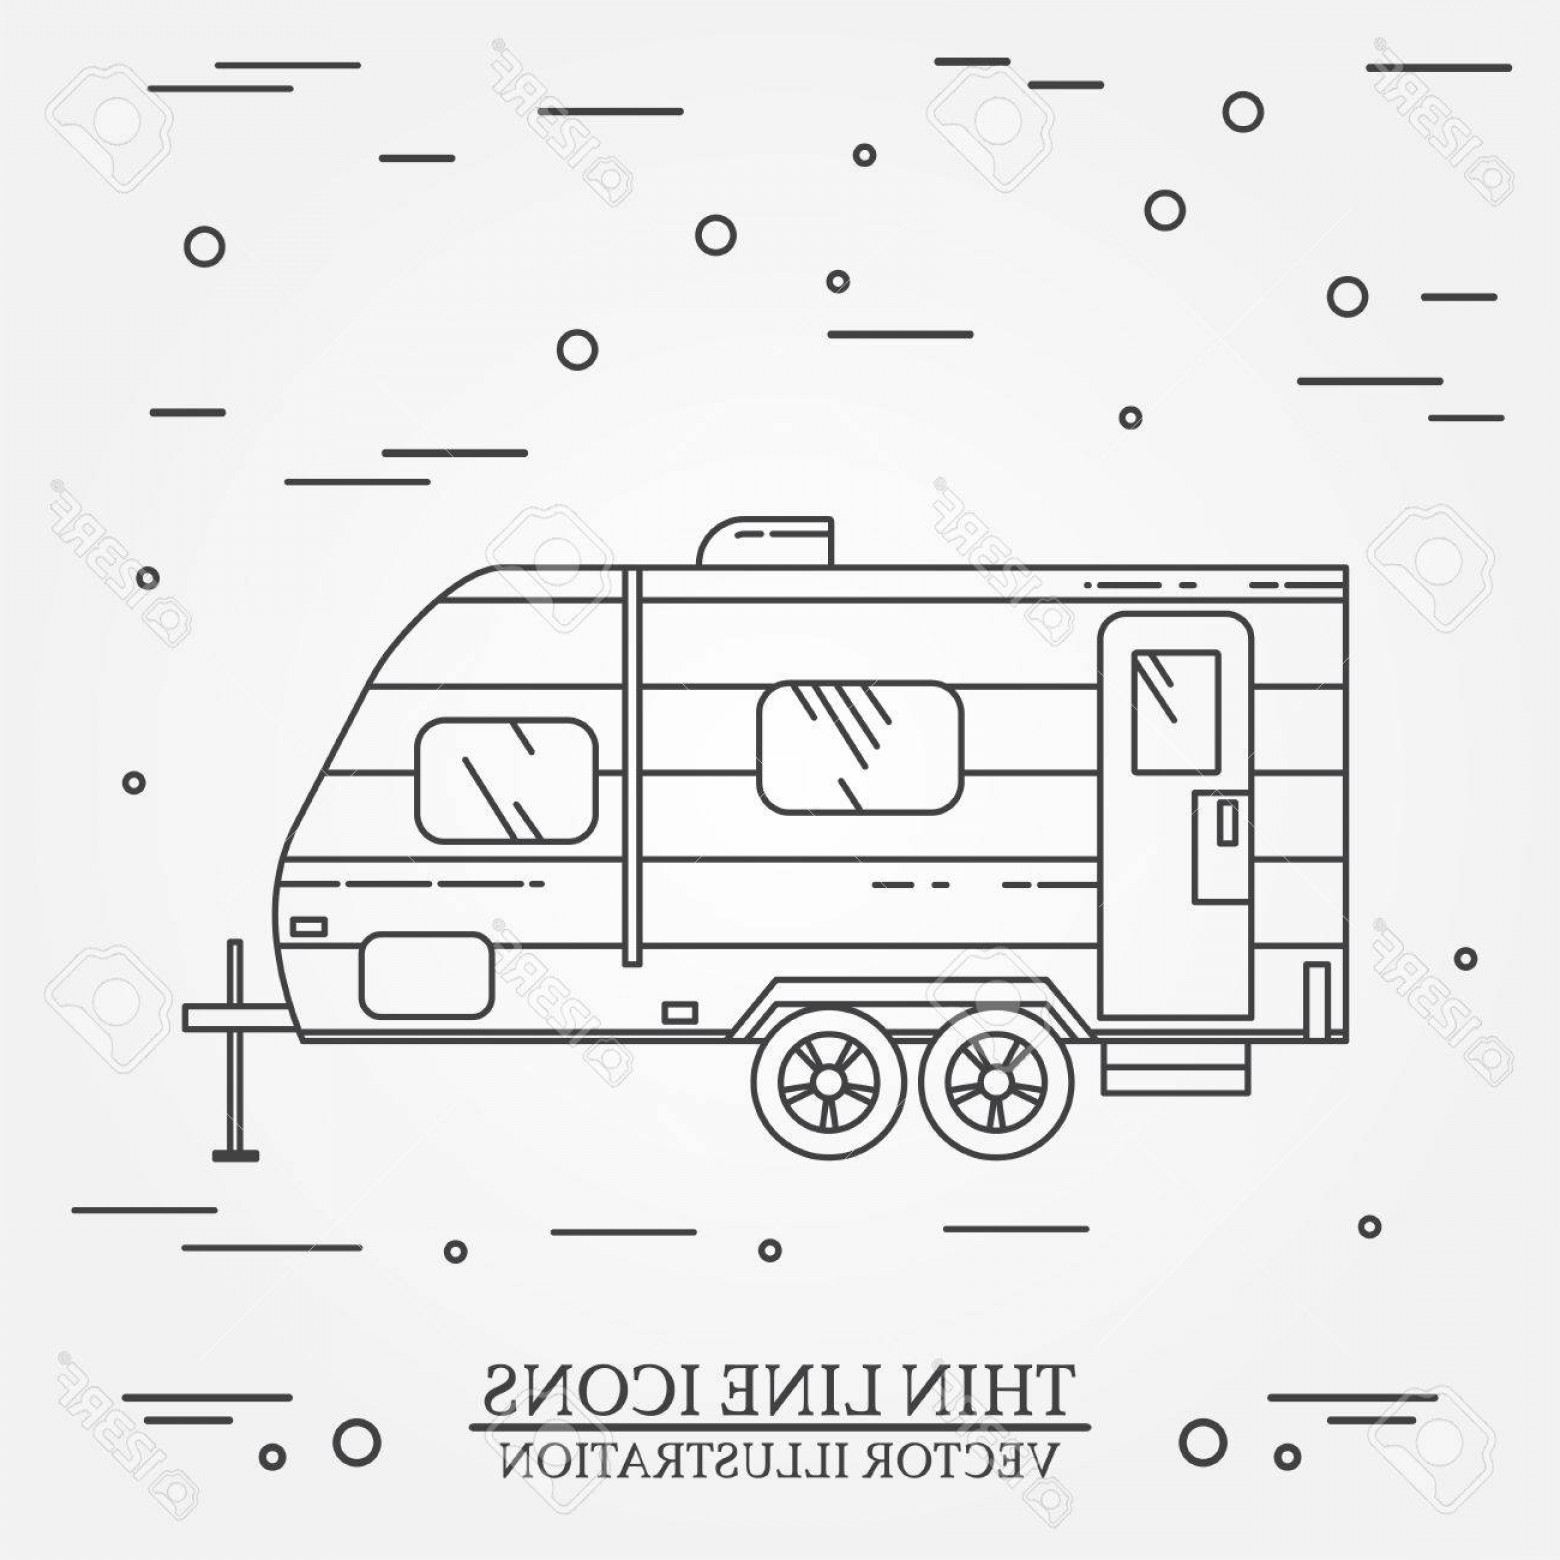 1560x1560 Photostock Vector Rv Camper Trailer Thin Line Camping Rv Trailer